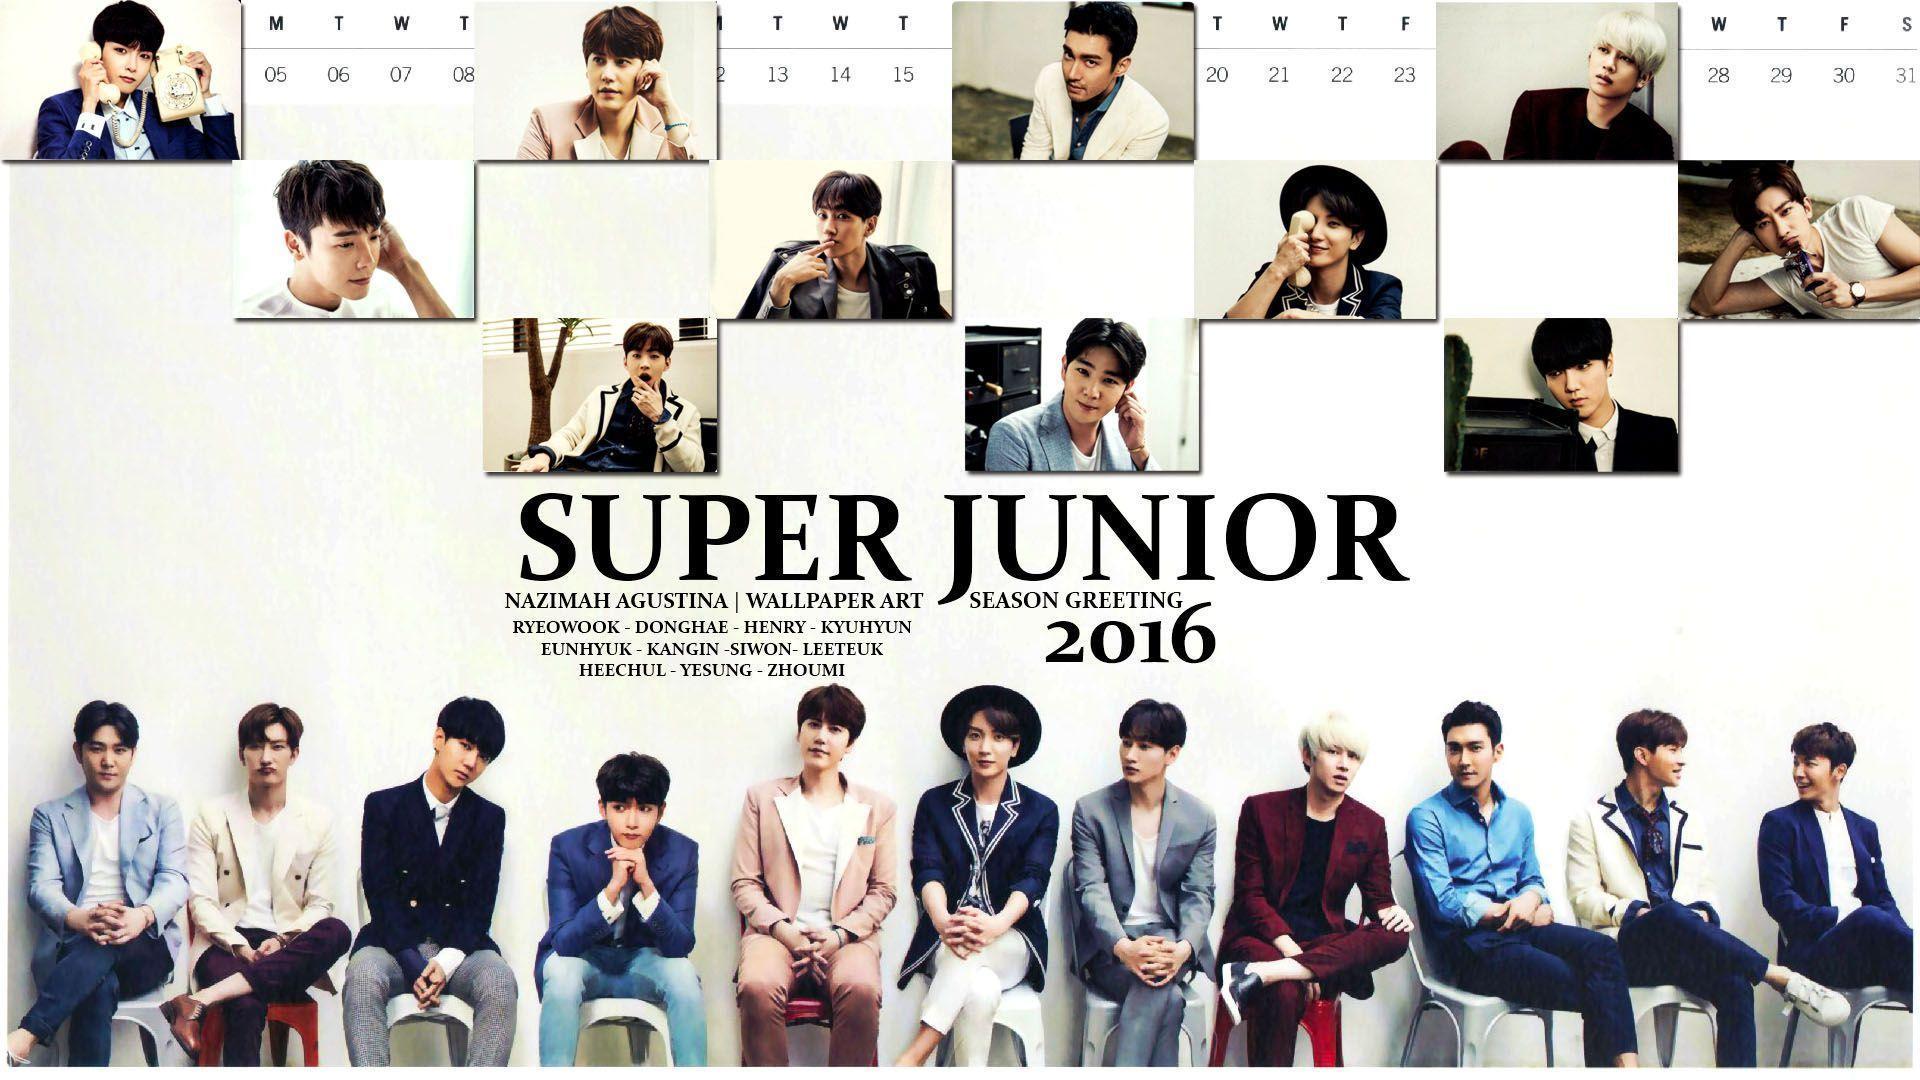 Super junior 2016 wallpapers wallpaper cave super junior 2016 season greeting wallpaper by nazimah agustina m4hsunfo